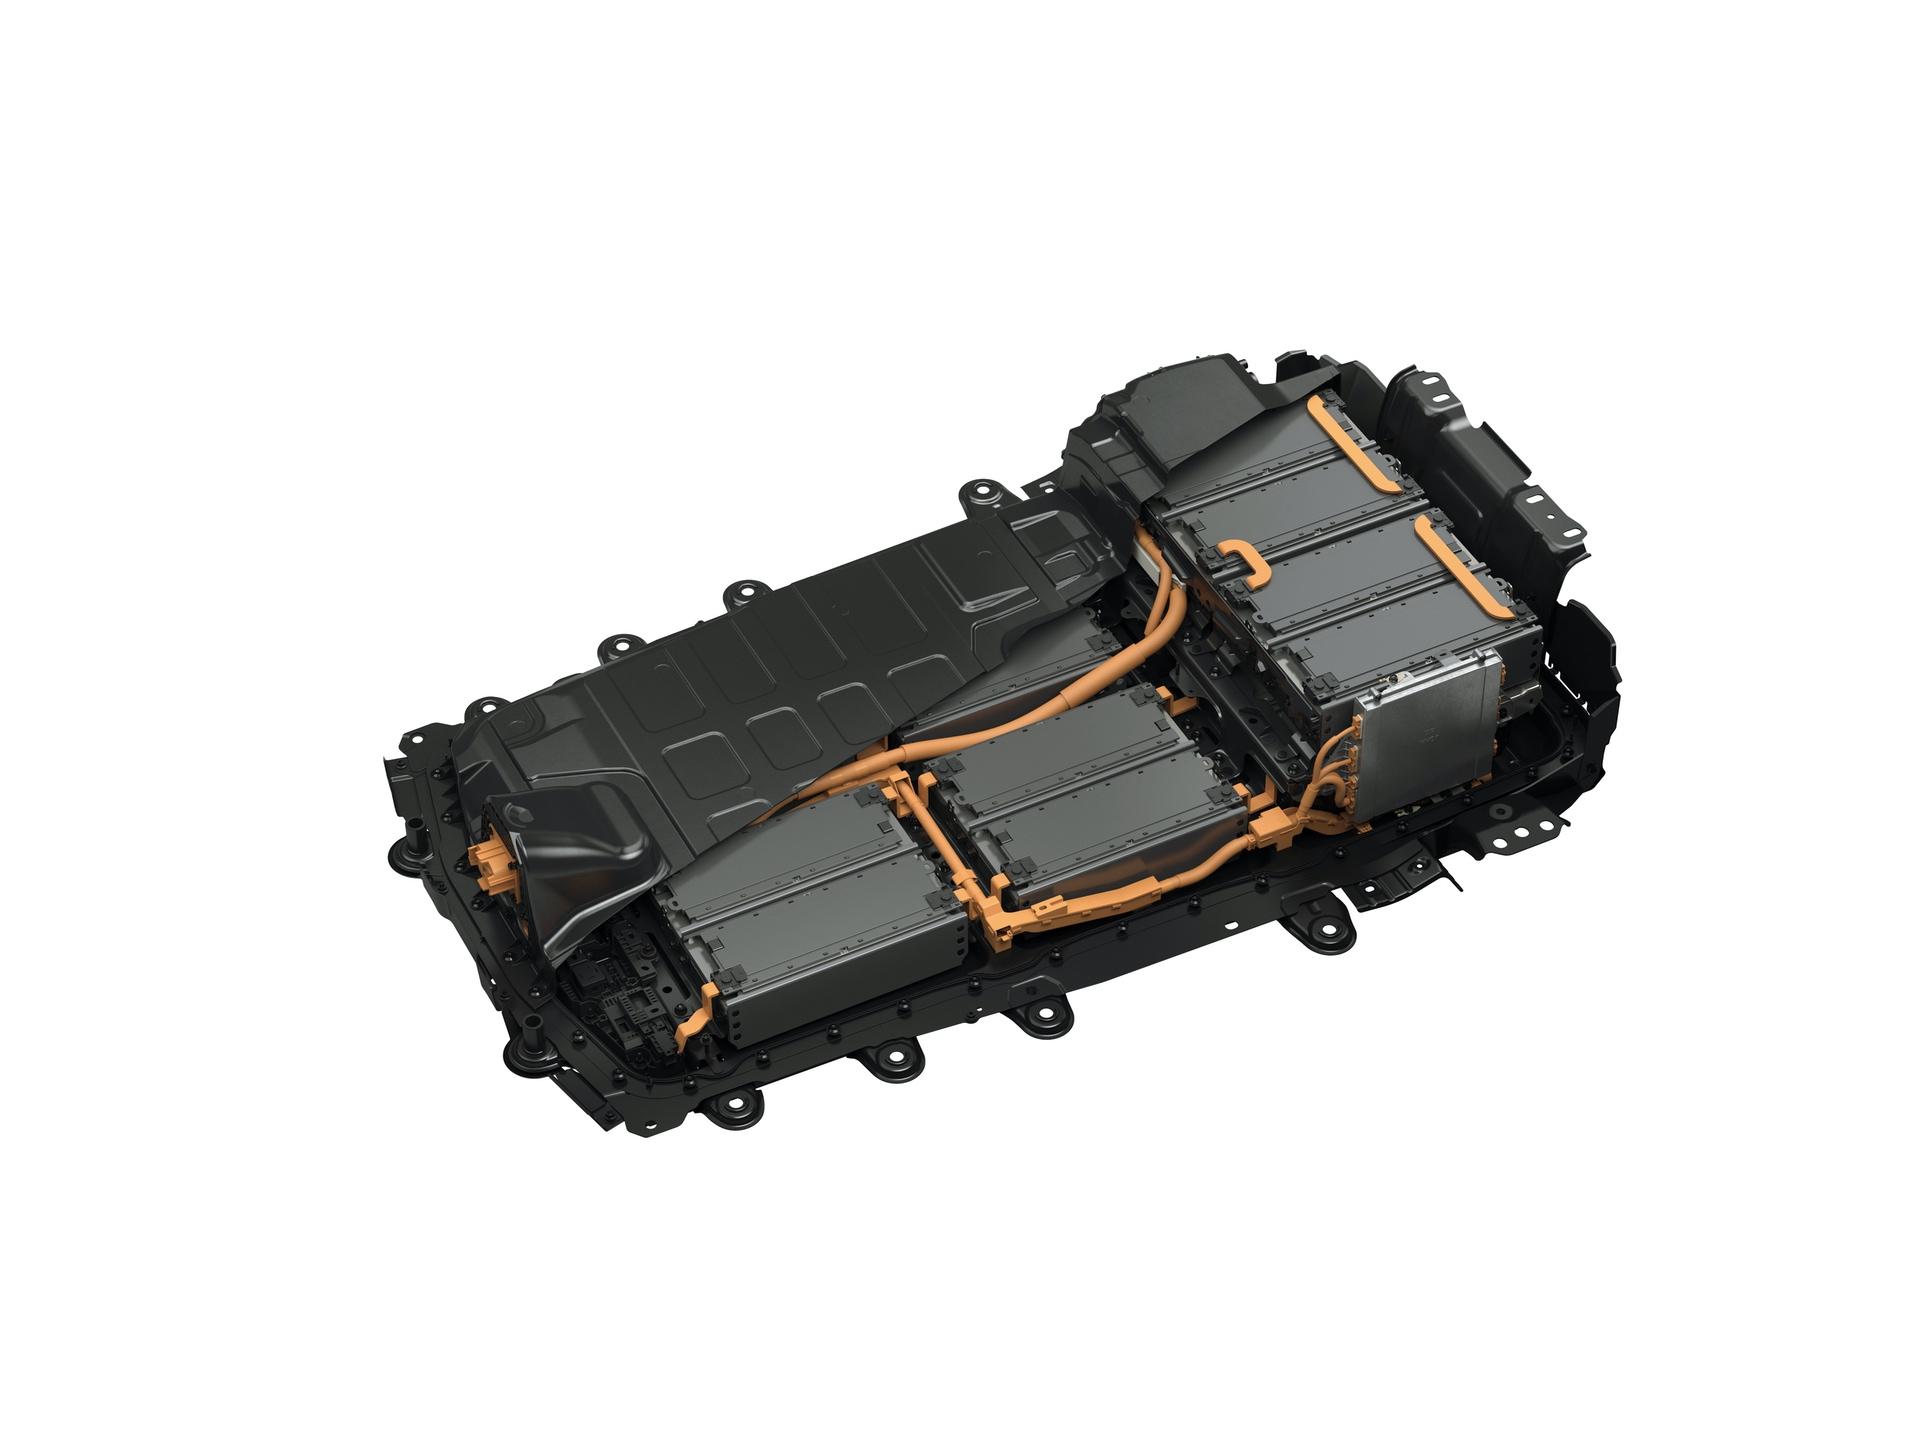 Mazda_MX-30_launch_0104